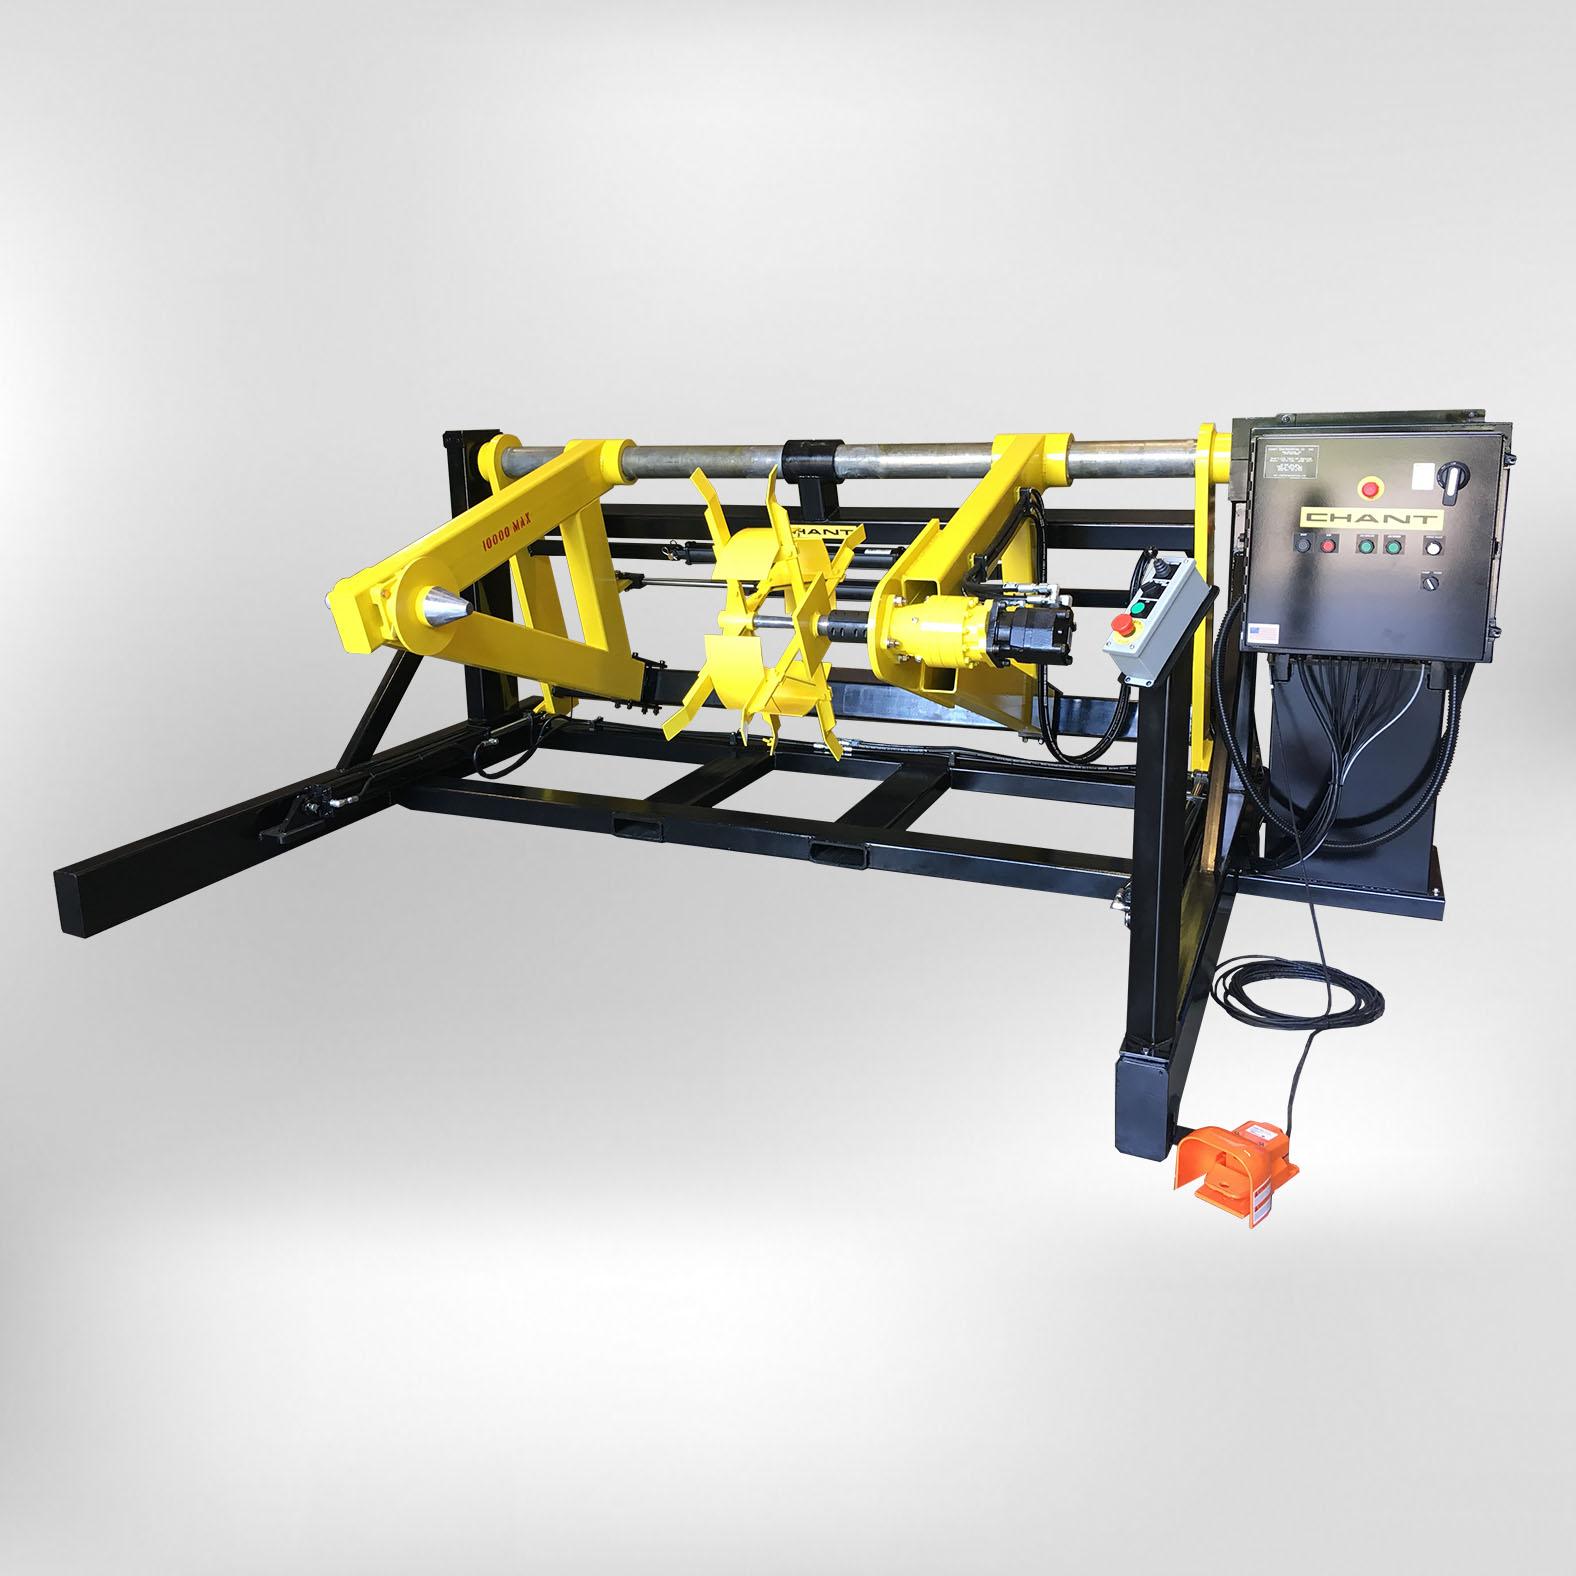 FMTU Reeling Machine Product Box